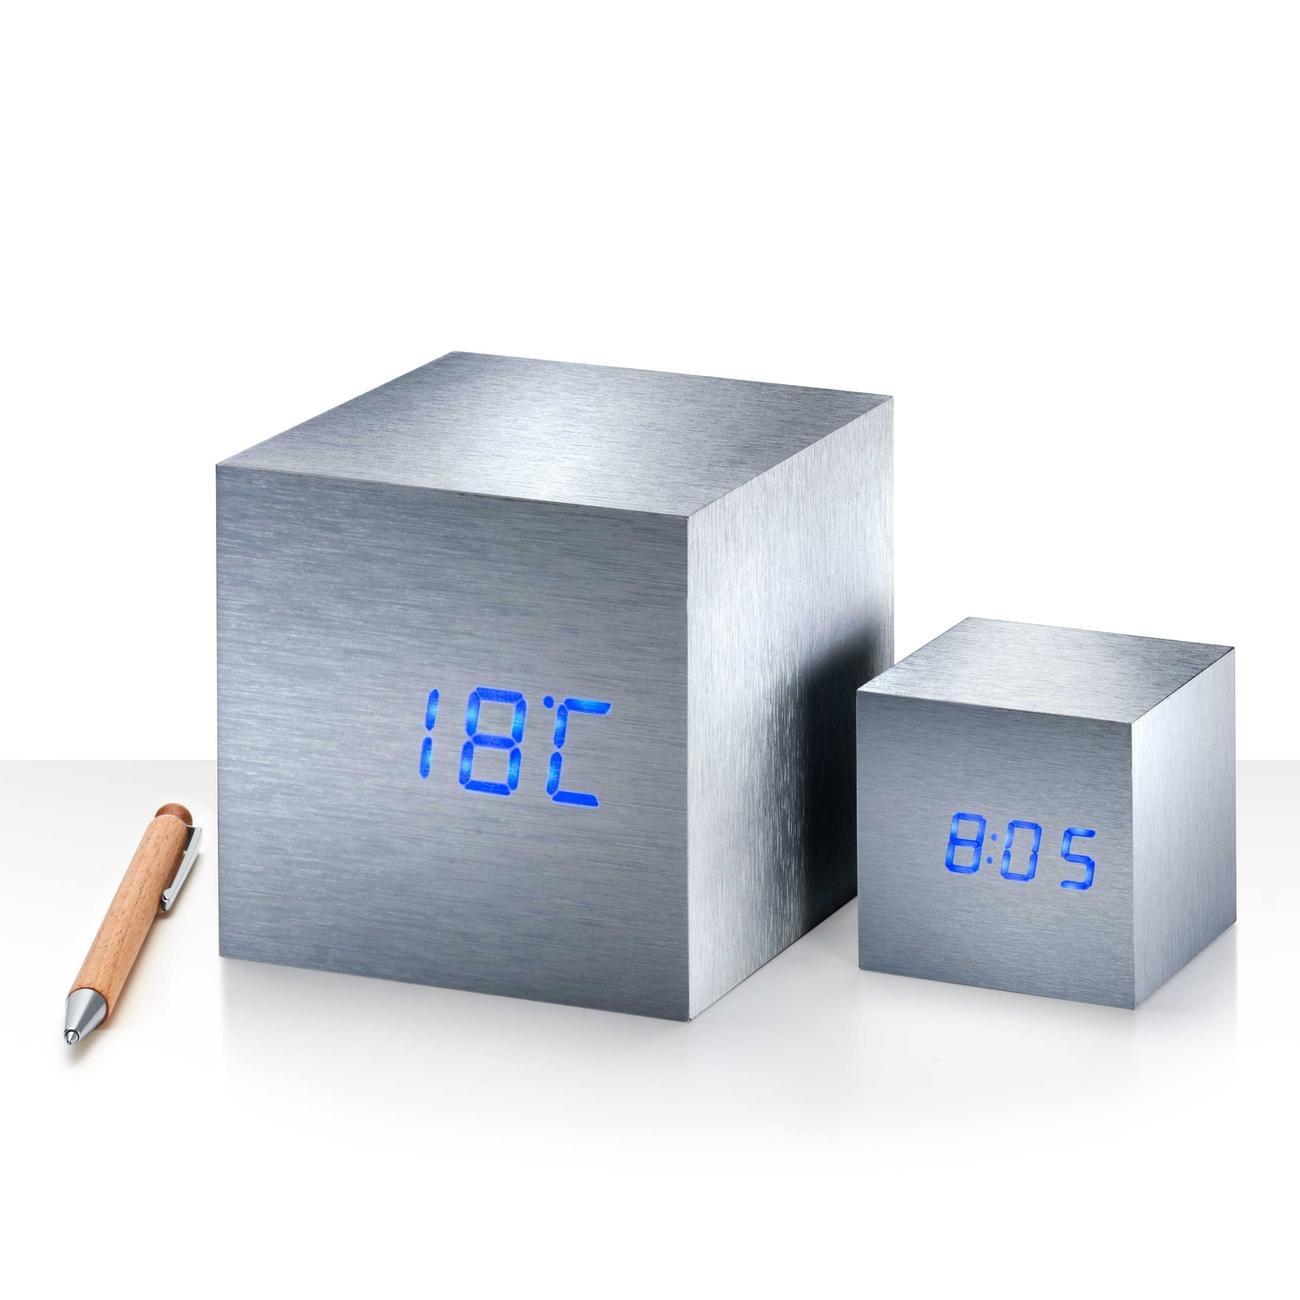 mini cube 3 jahre garantie pro idee. Black Bedroom Furniture Sets. Home Design Ideas